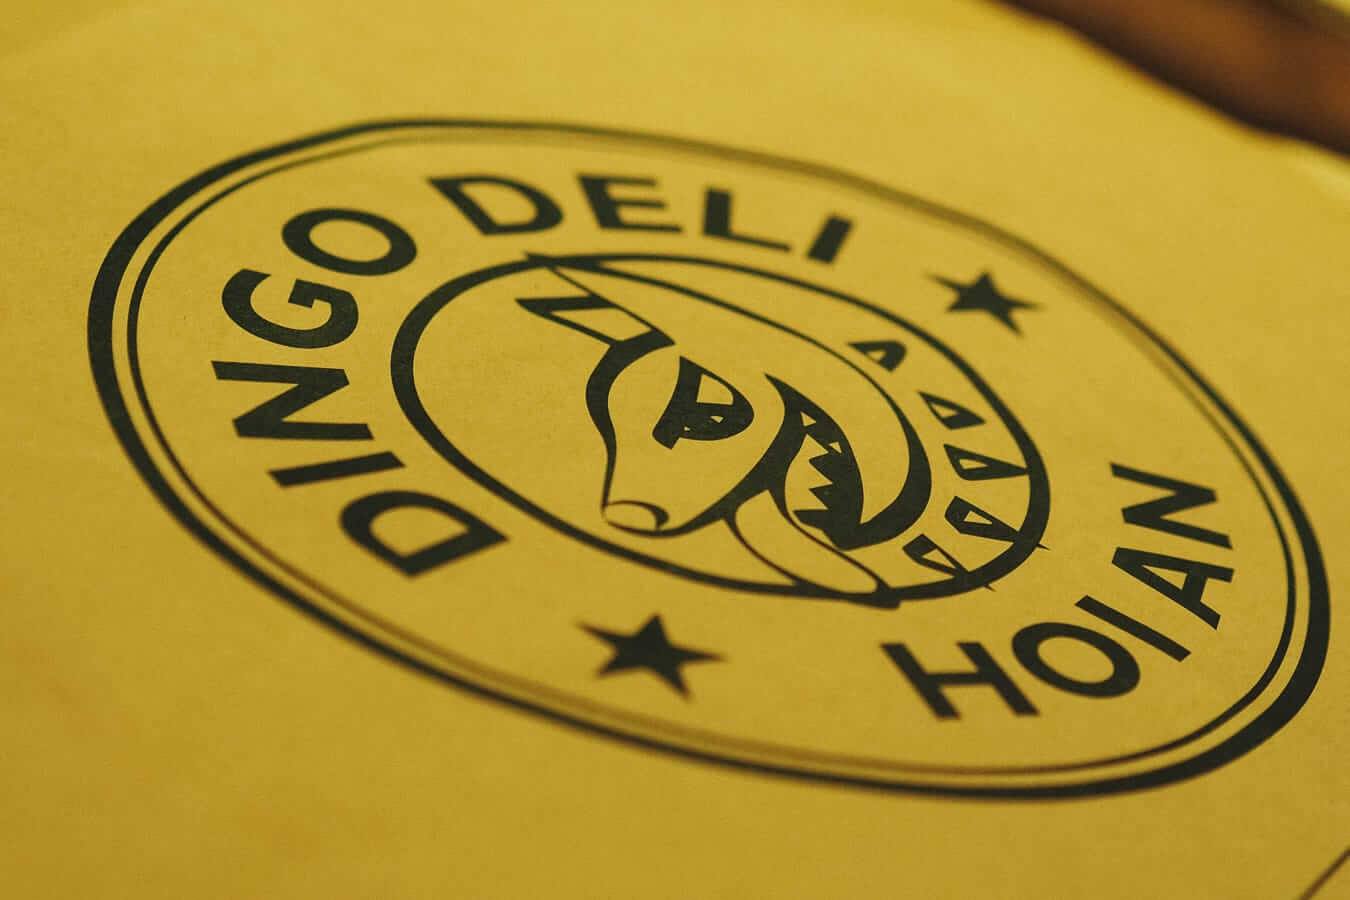 Dingo Deli: Western Hoi An Restaurants